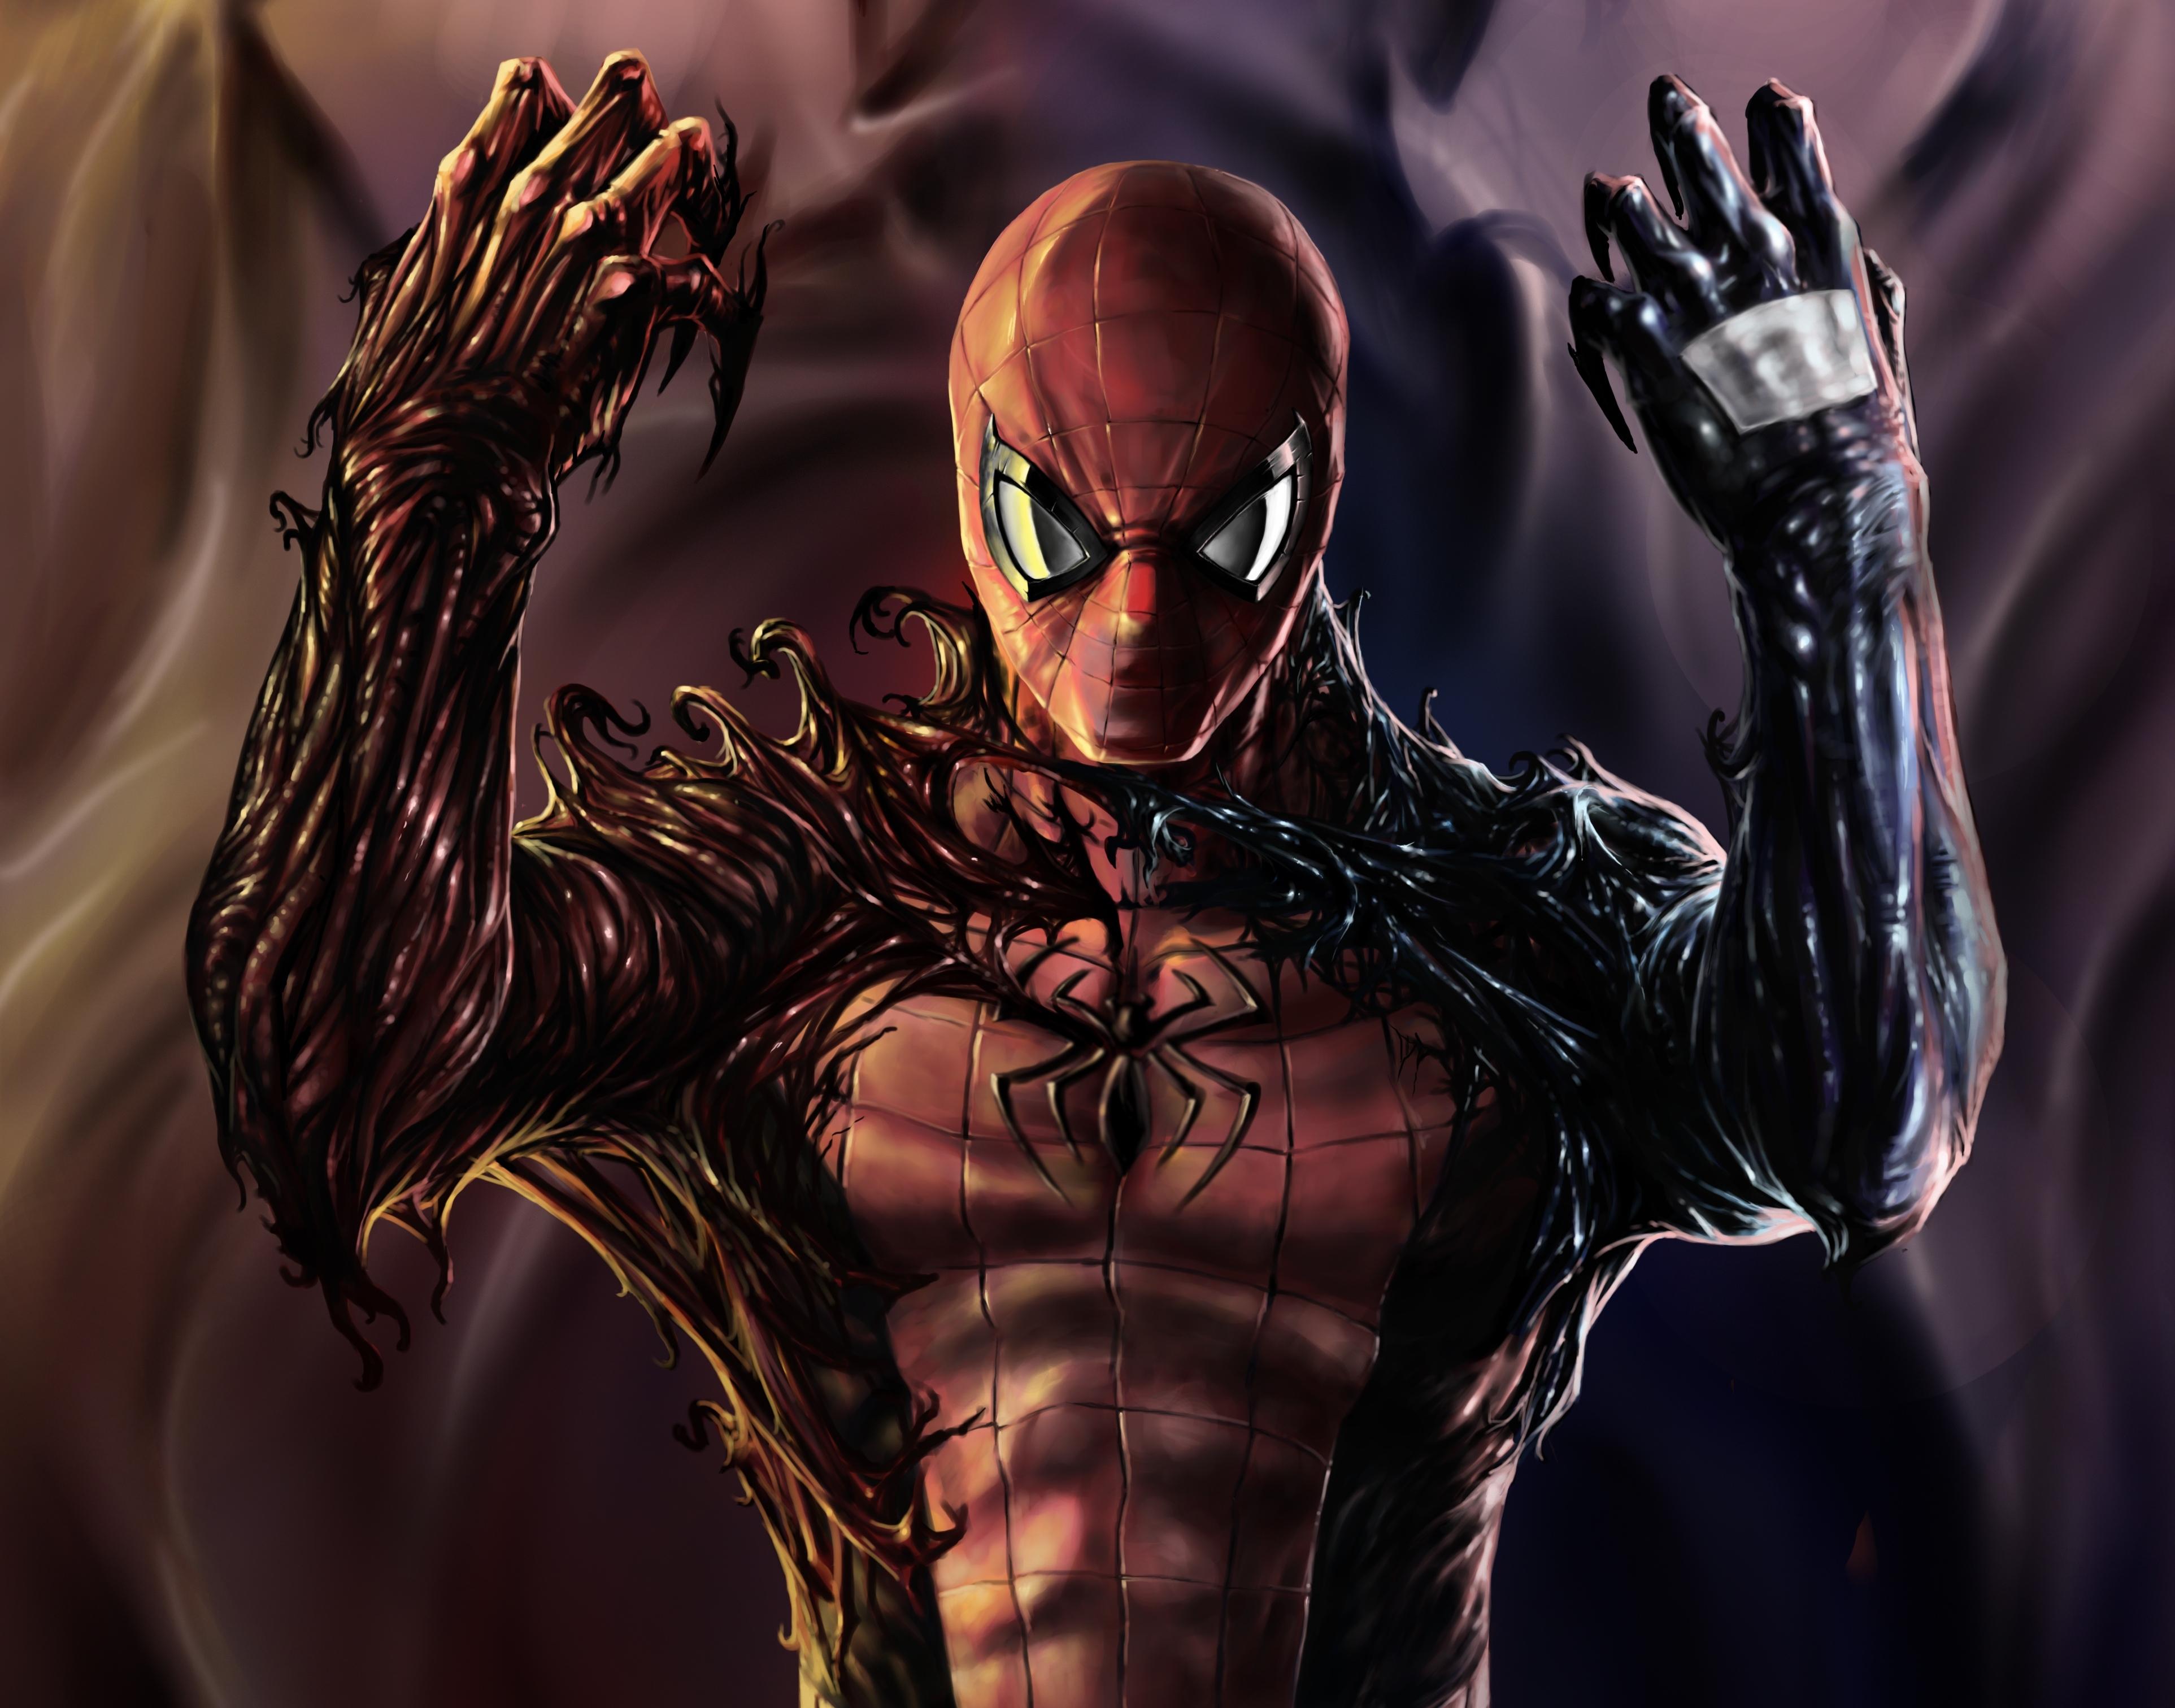 Carnage Venom Spiderman Artwork, HD Superheroes, 4k ...